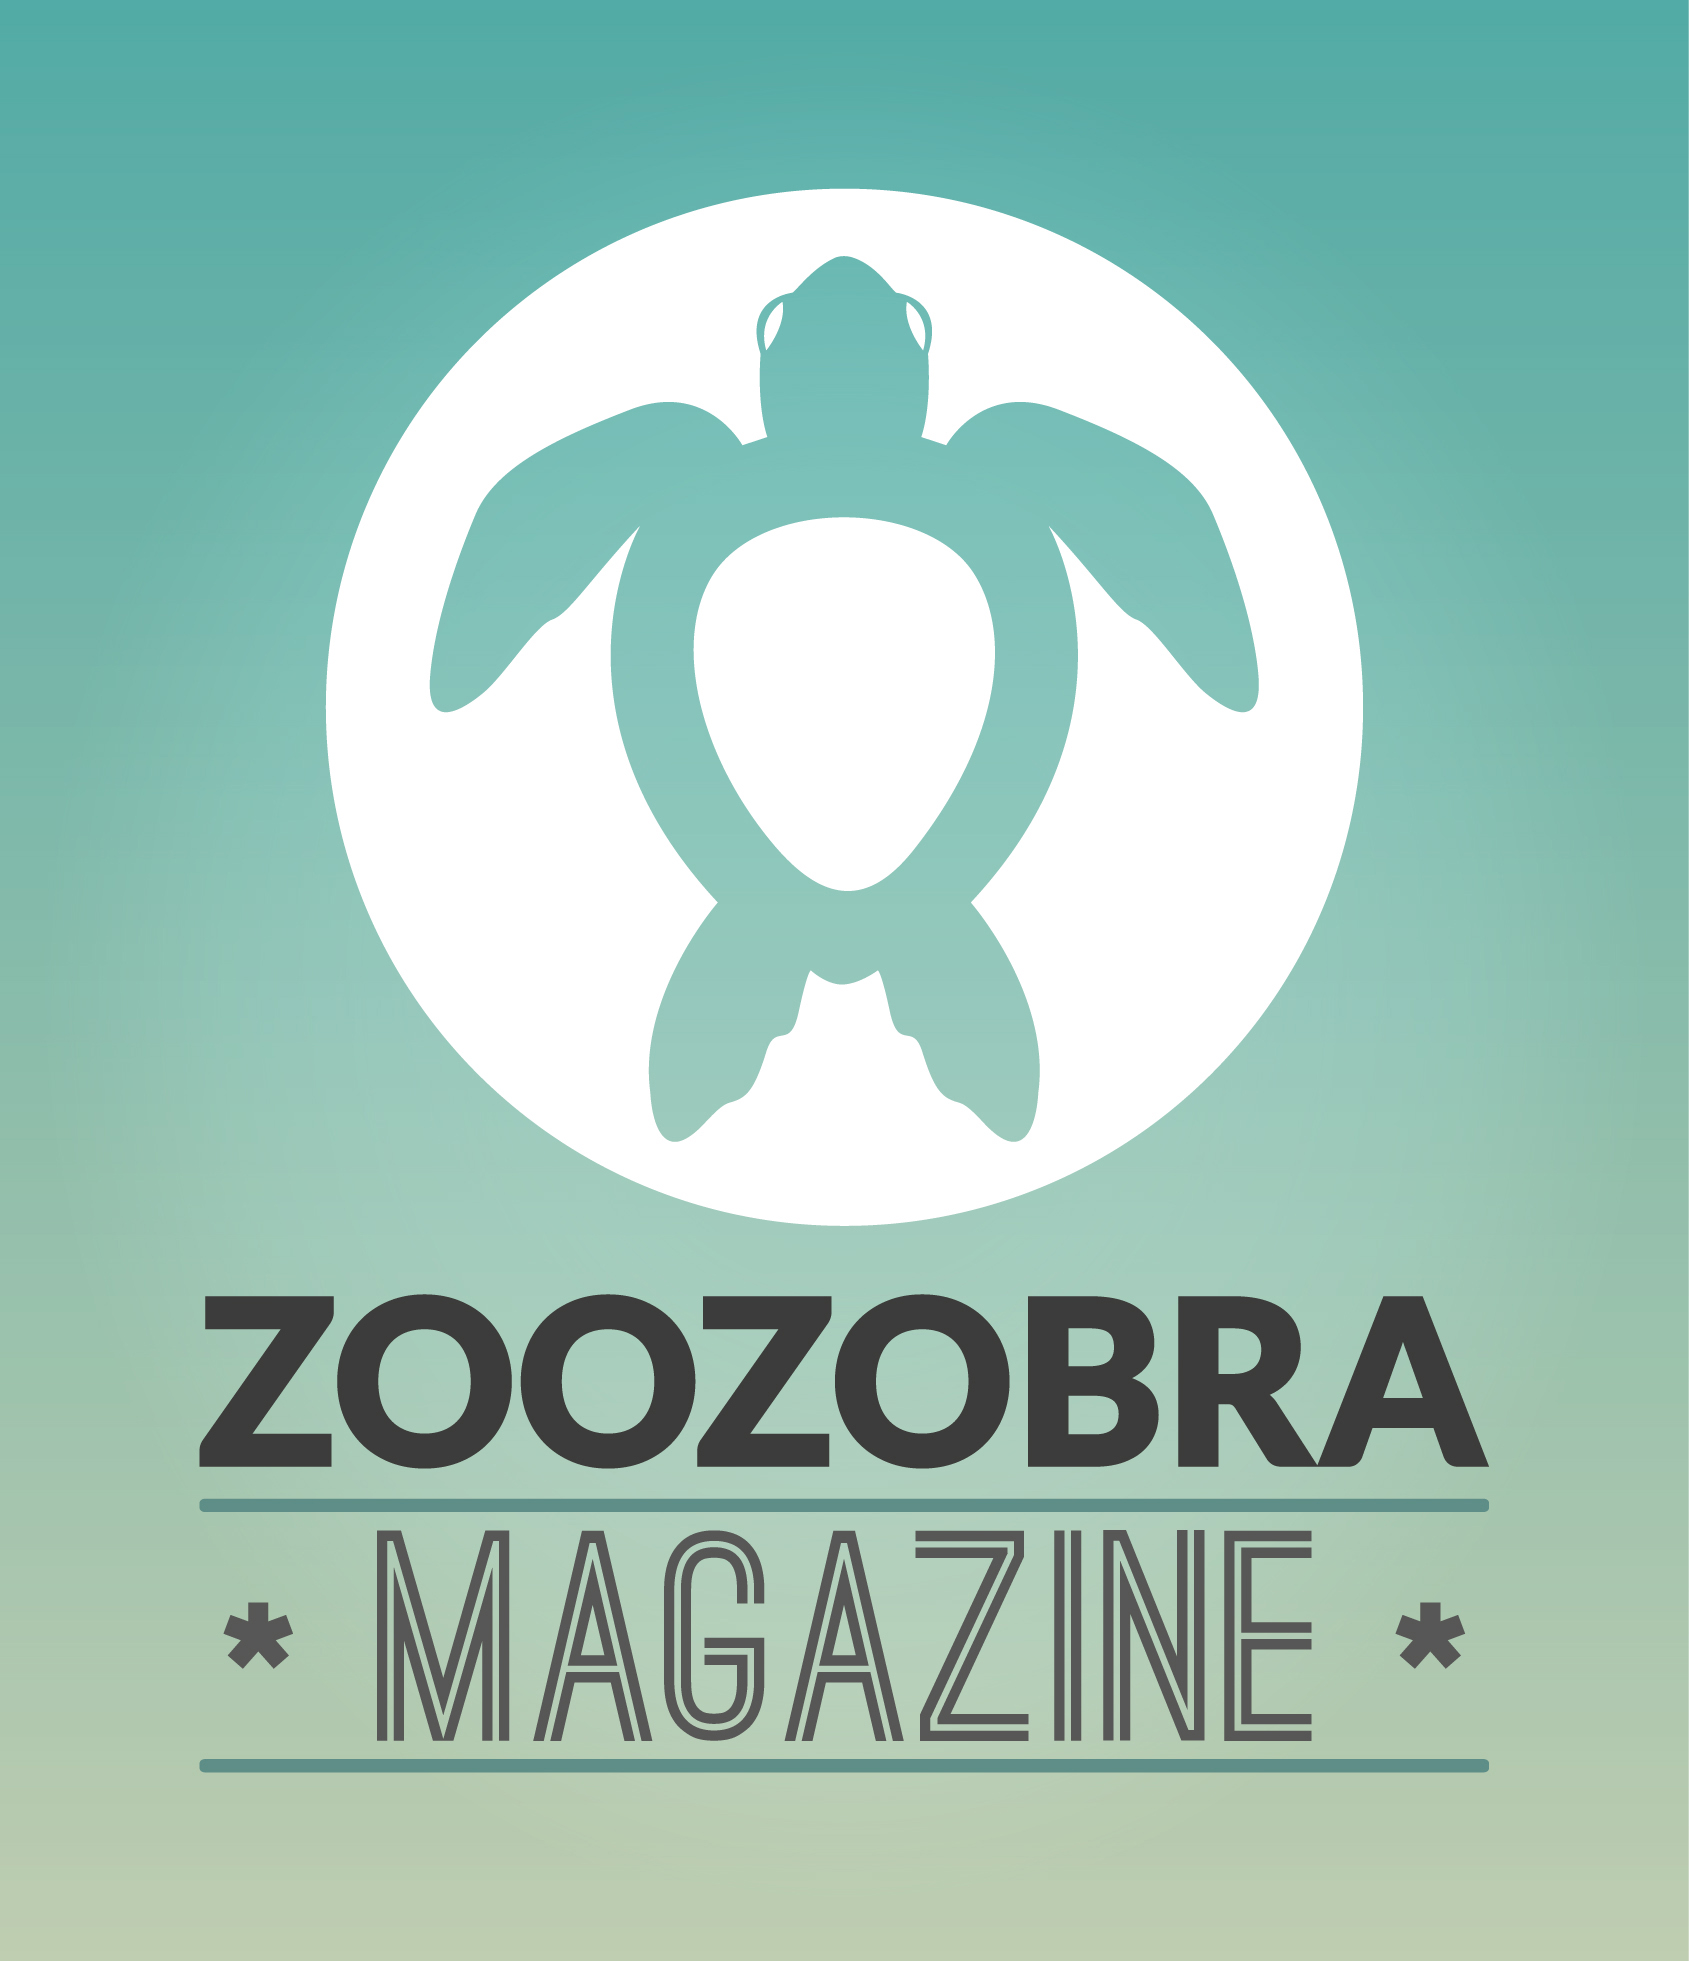 Nueva web de Zoozobra Magazine